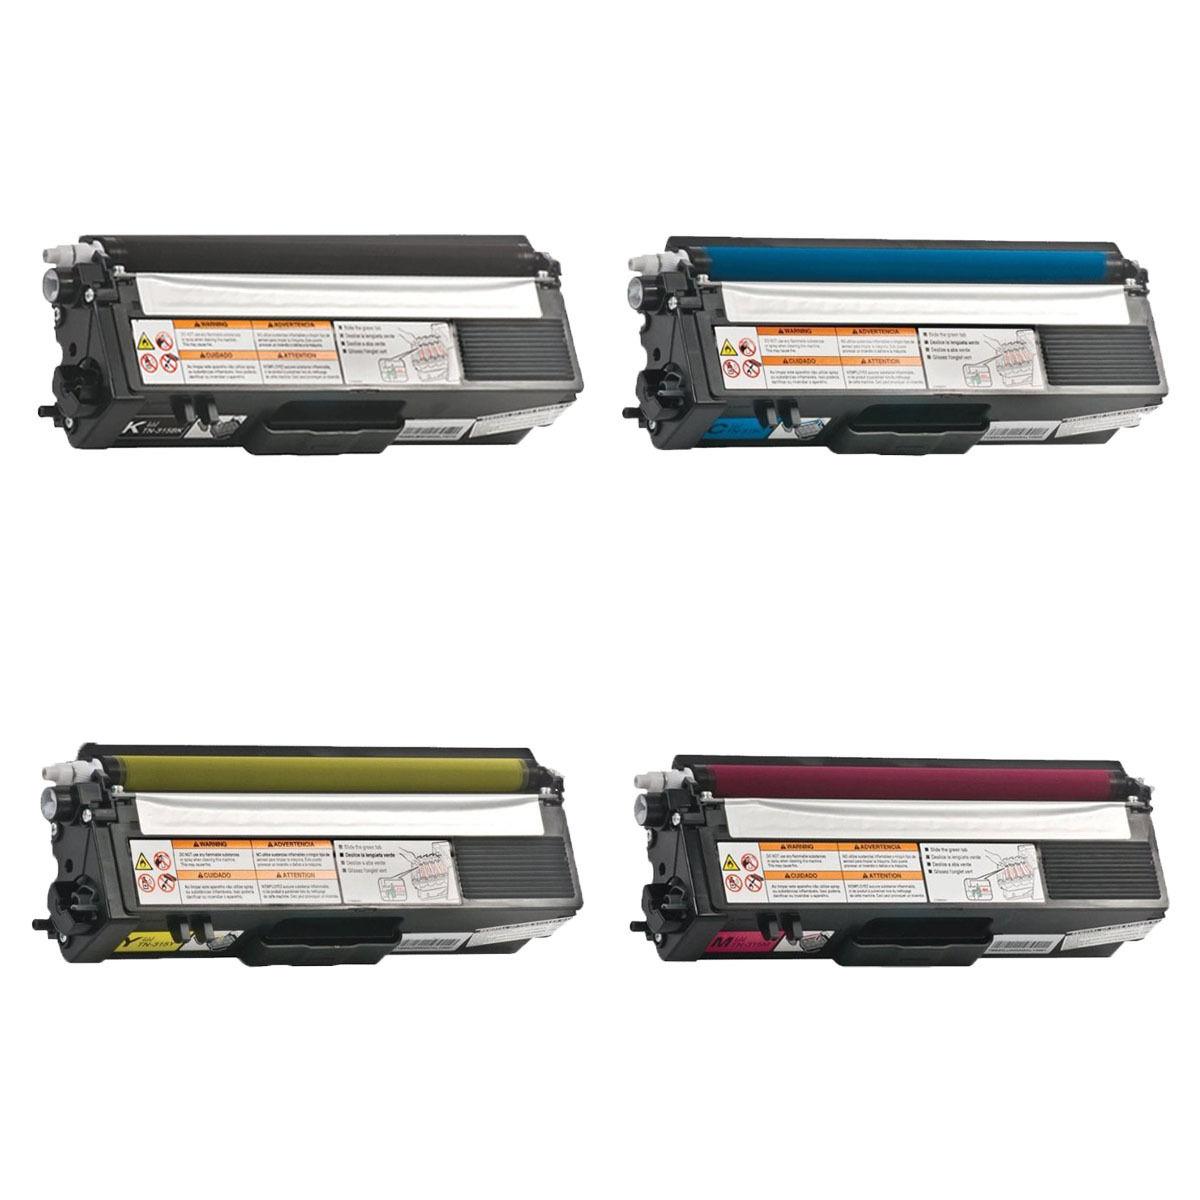 Details about 4PK TN315 Toner Set Compatible for Brother HL4150cdn  HL4570cdw MFC9460cdn 9560